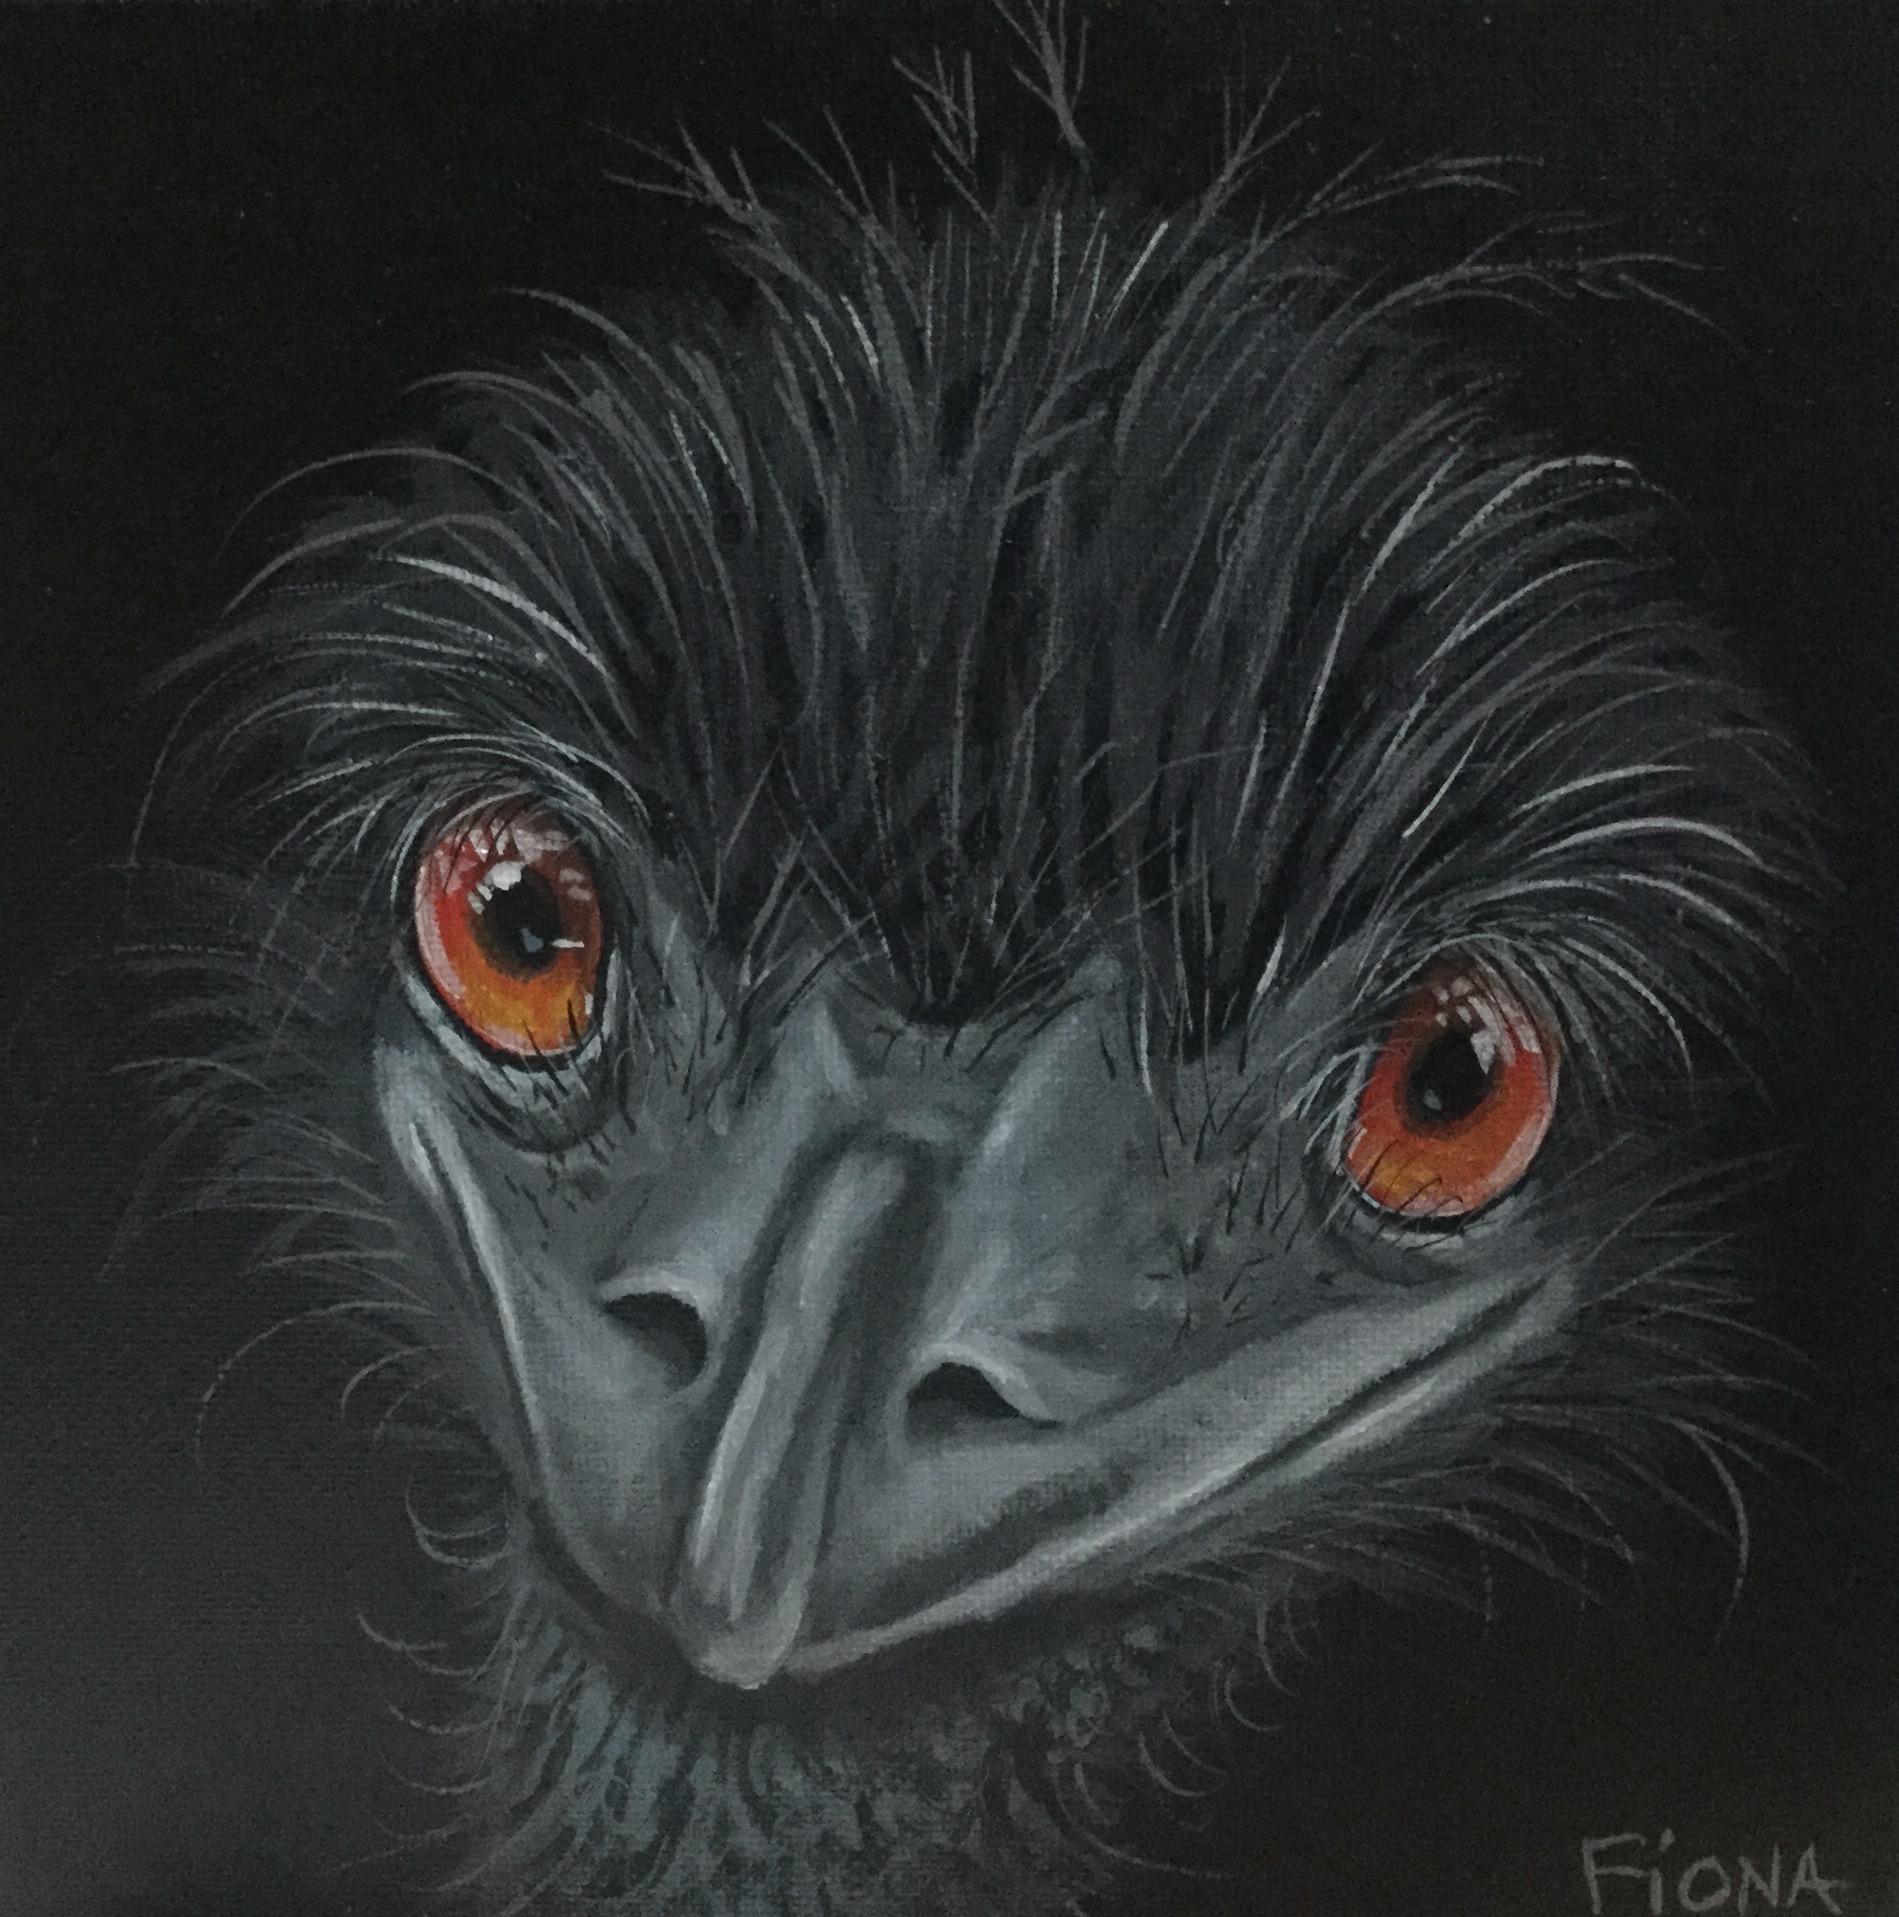 hi im an emu